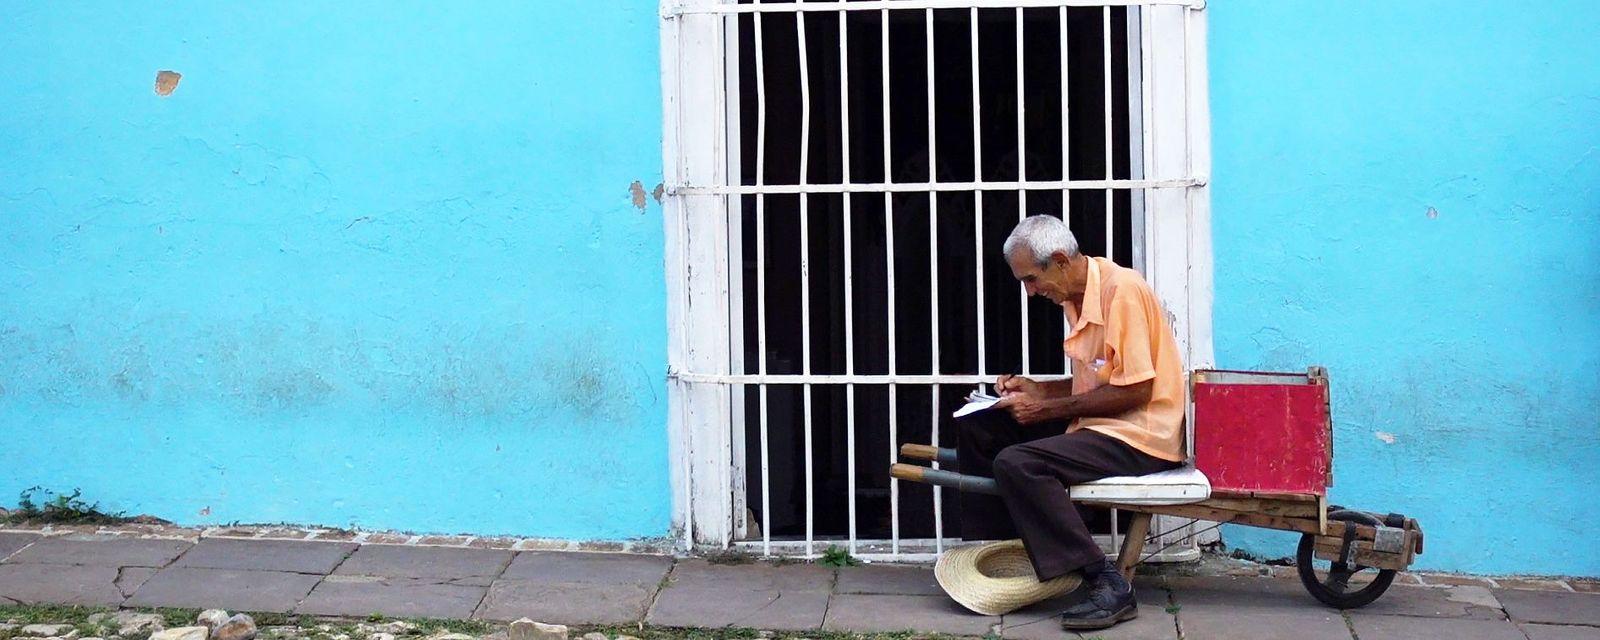 Luis Martinez, Cuba's 'imaginary tourist' (Credit: Credit: Alice Bellincioni & Giulia Paltrinieri)